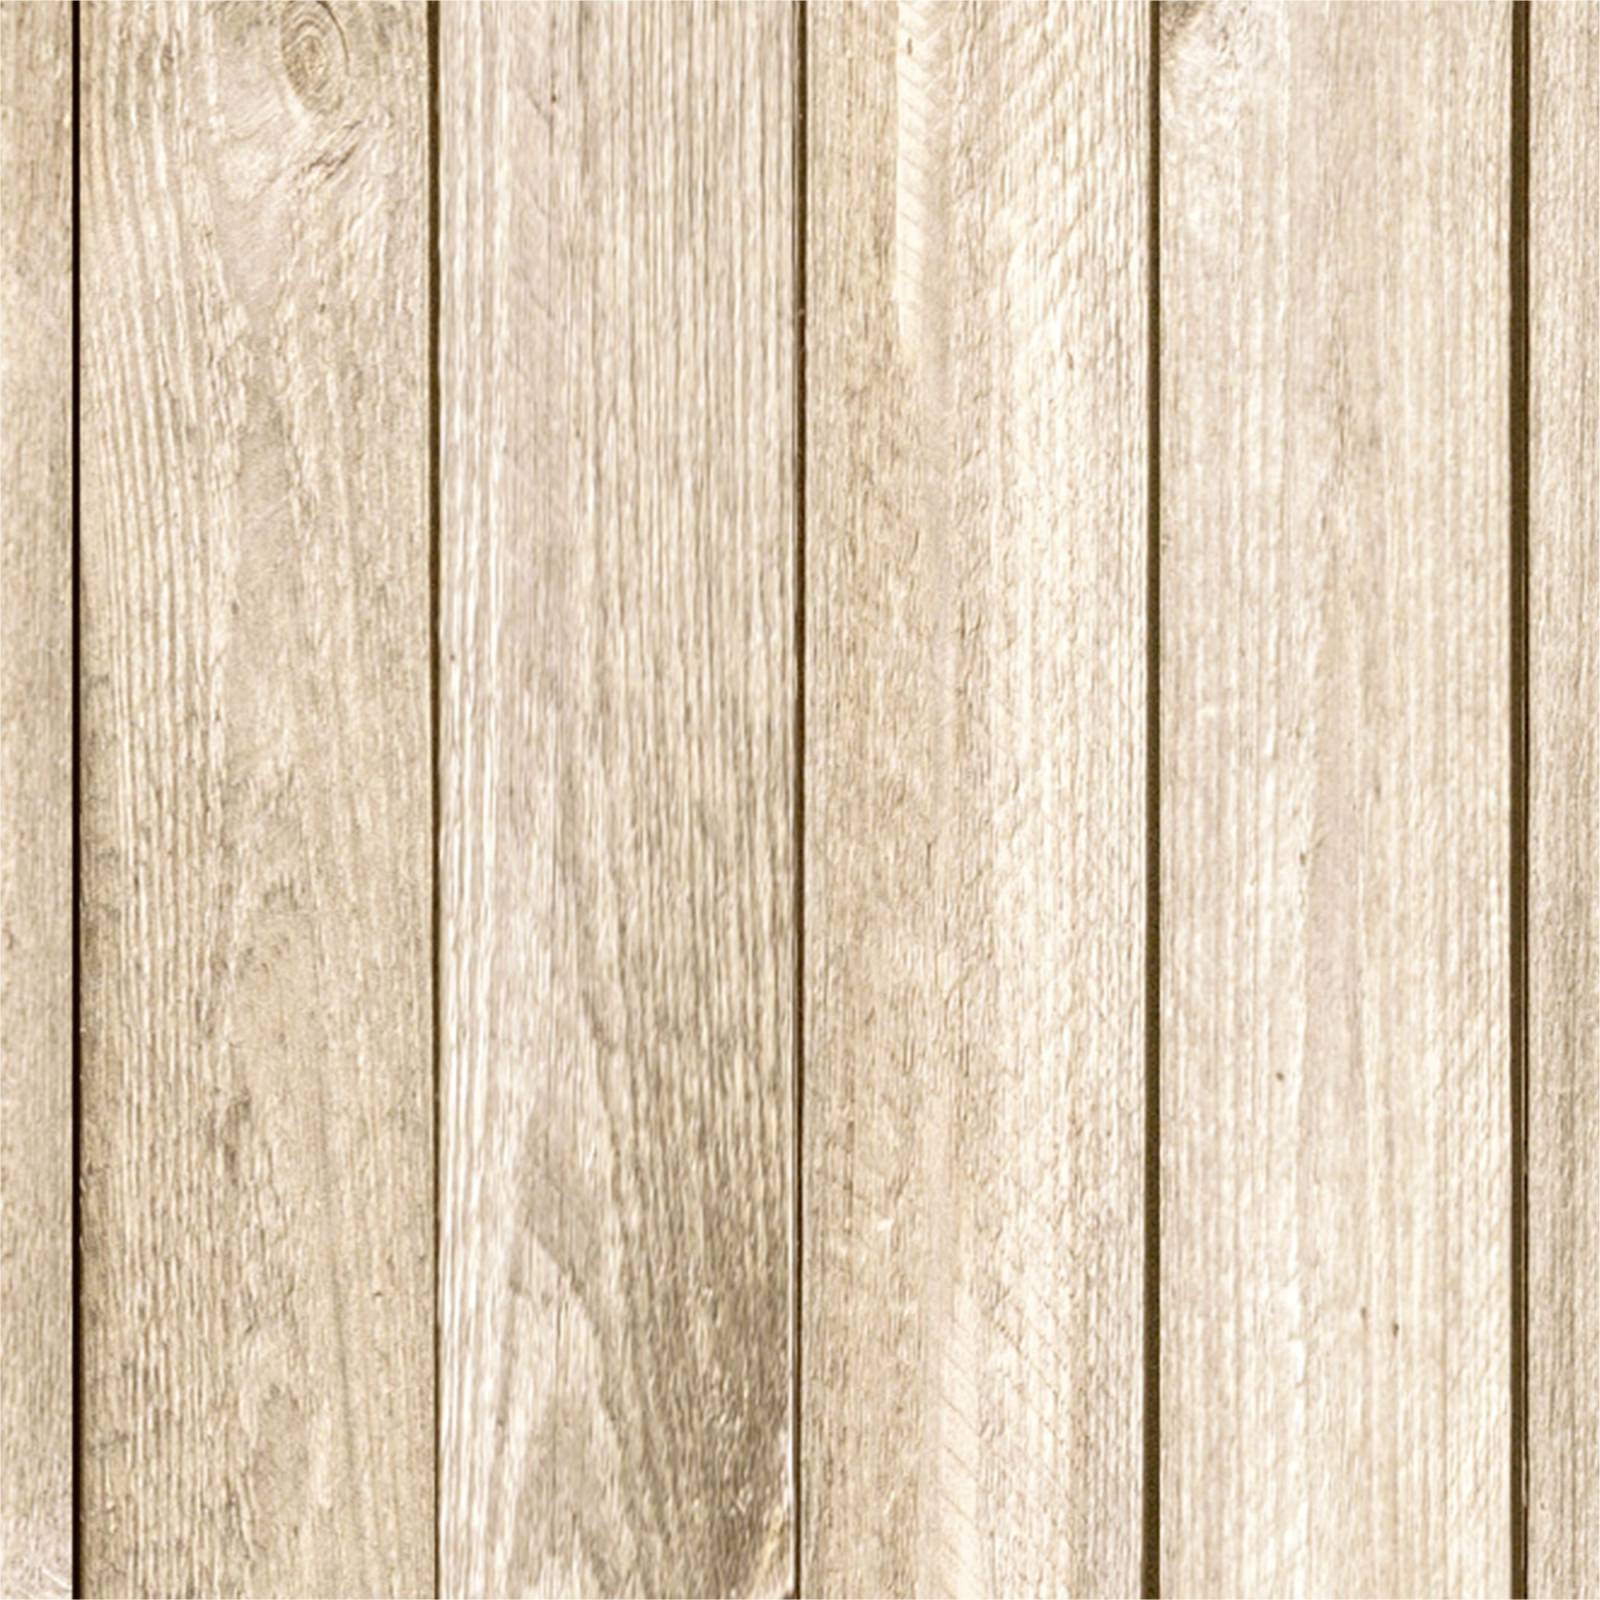 Papel de Parede Madeira Pinus/Rolo  - Redecorei